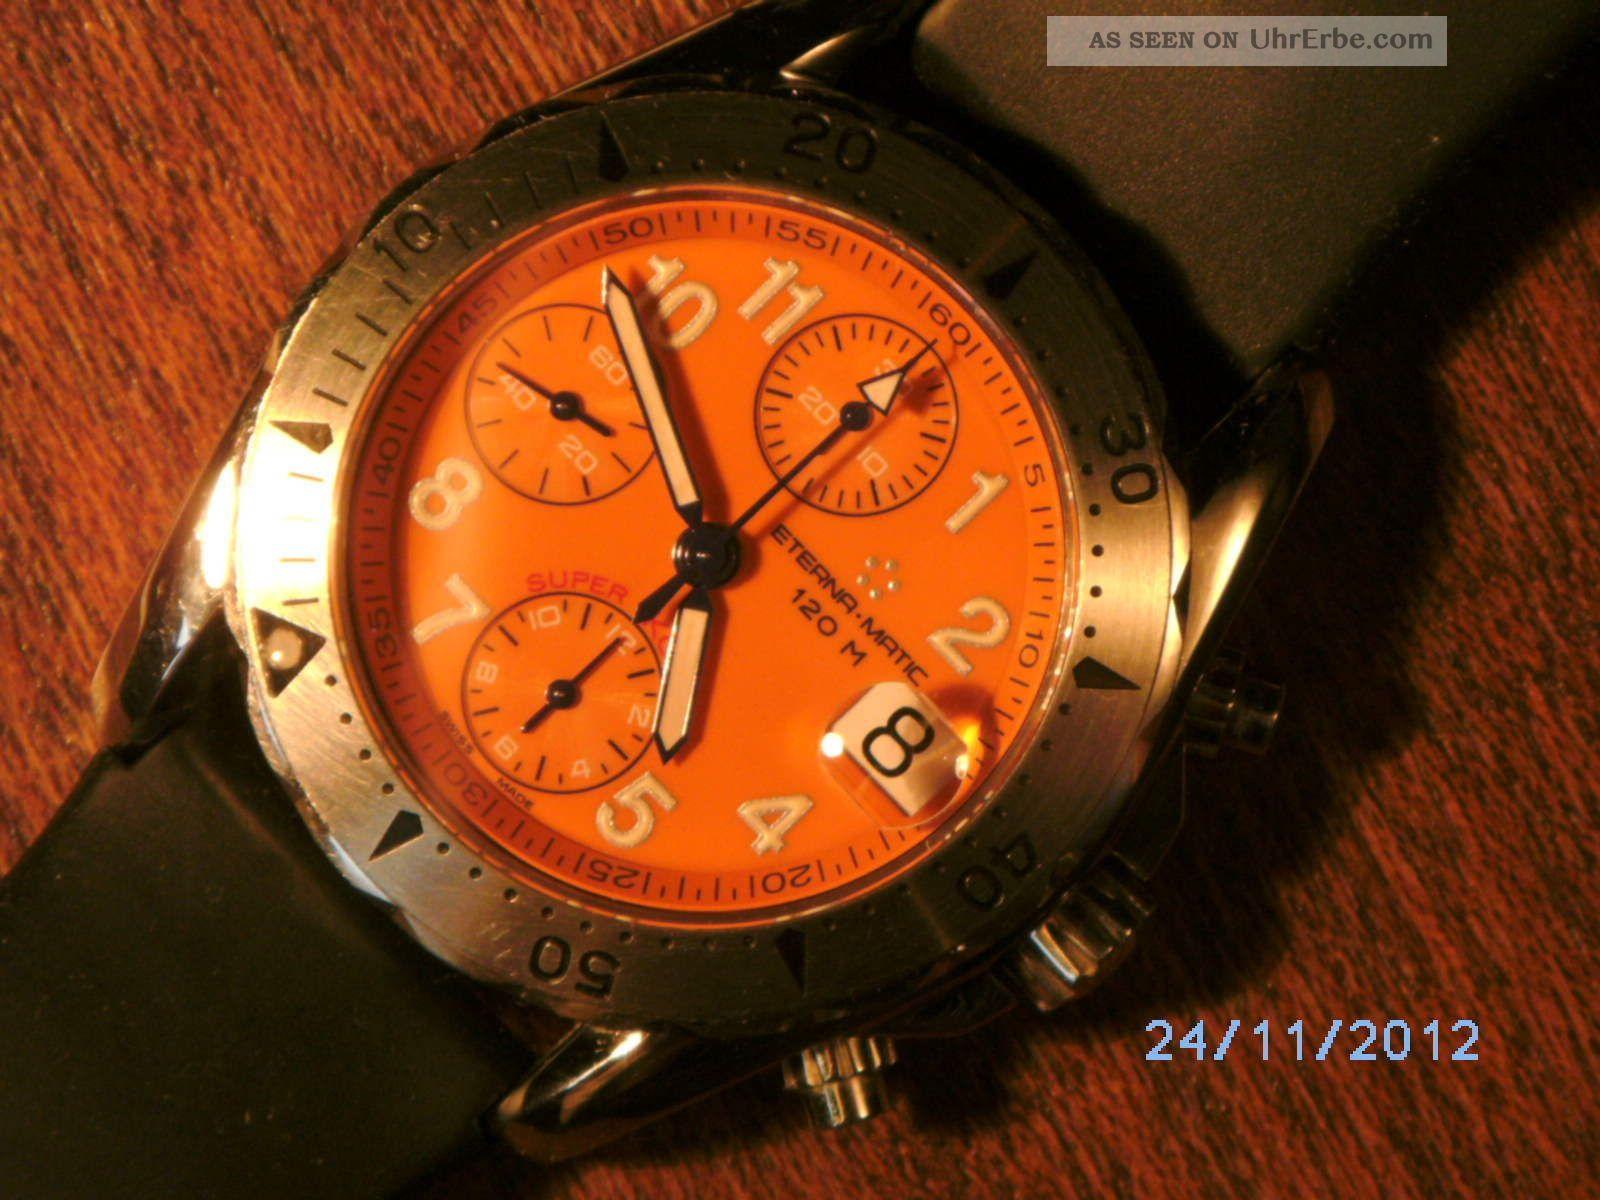 Eterna Kontiki Chronograph Armbanduhren Bild